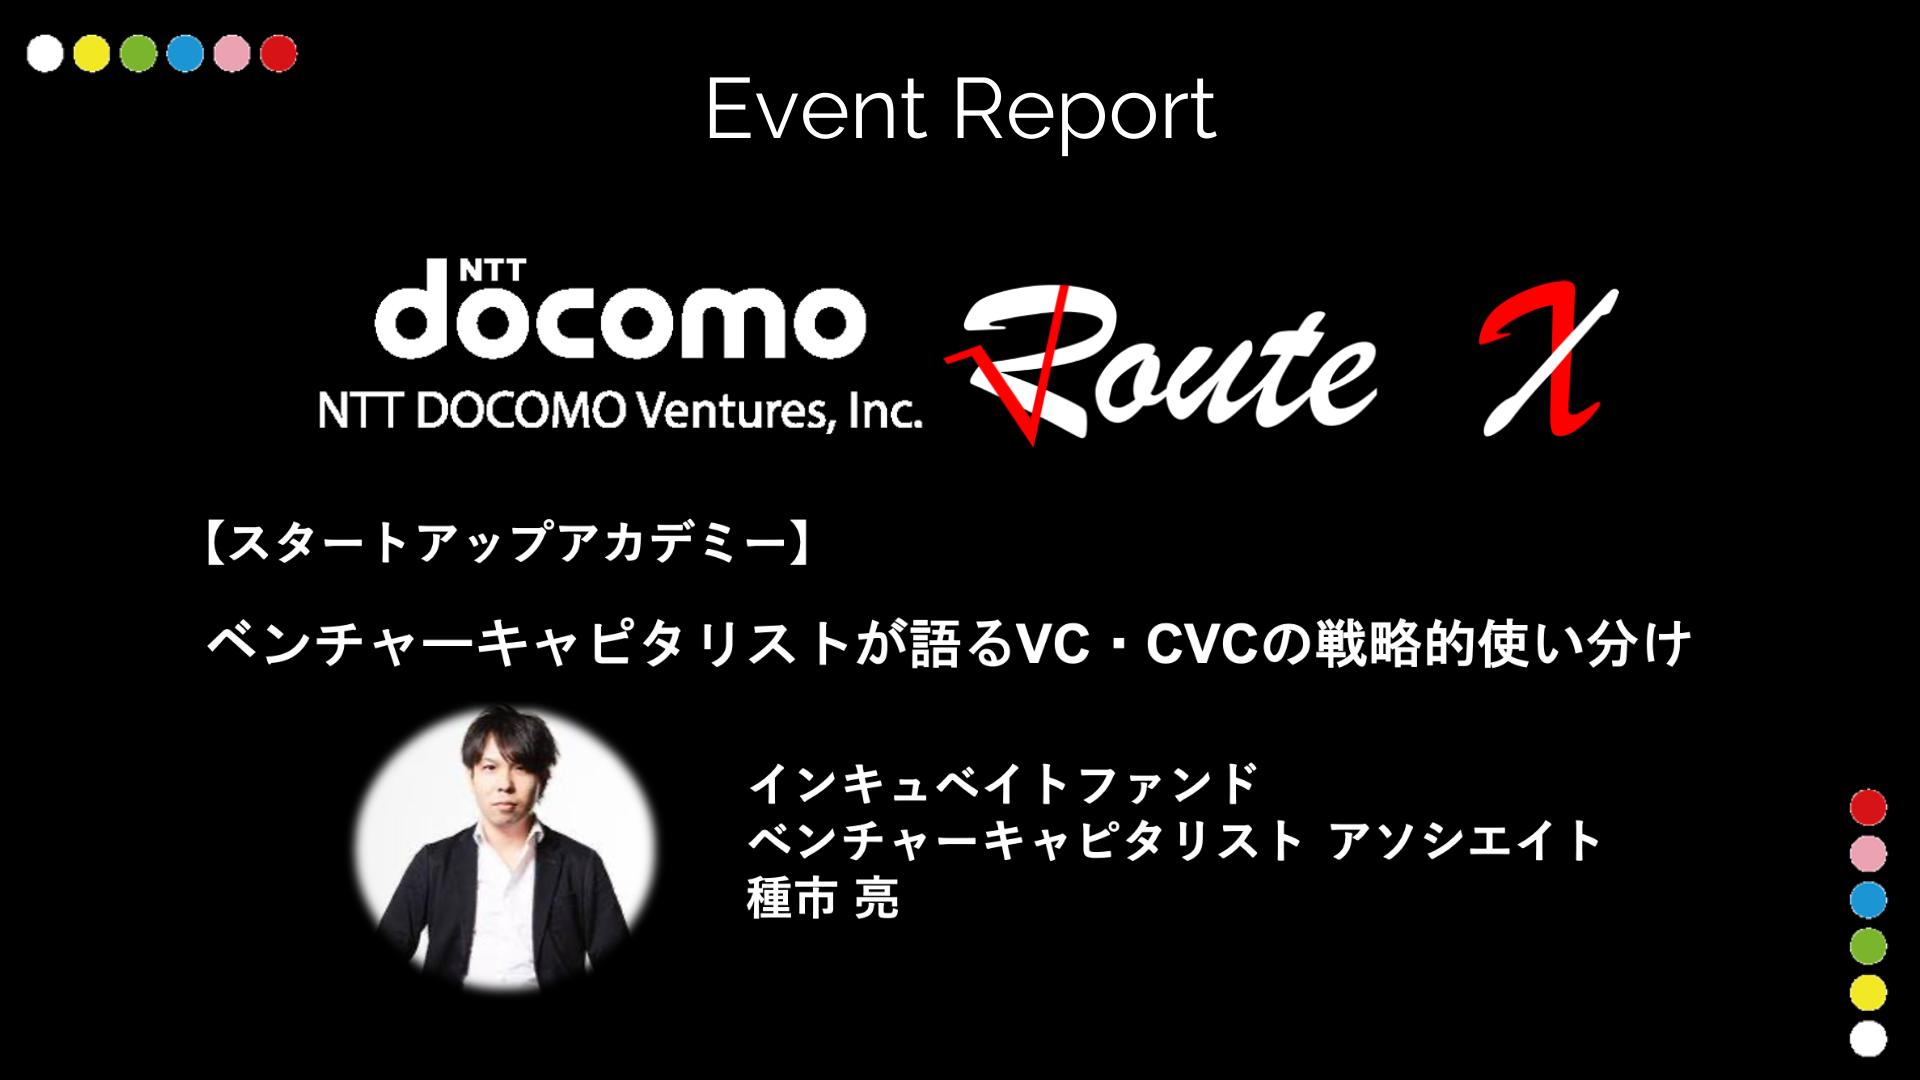 RouteX ✖︎ NTT DOCOMO Ventures【Startup Academy #1】 ベンチャーキャピタリストが語るVC・CVCの戦略的使い分け